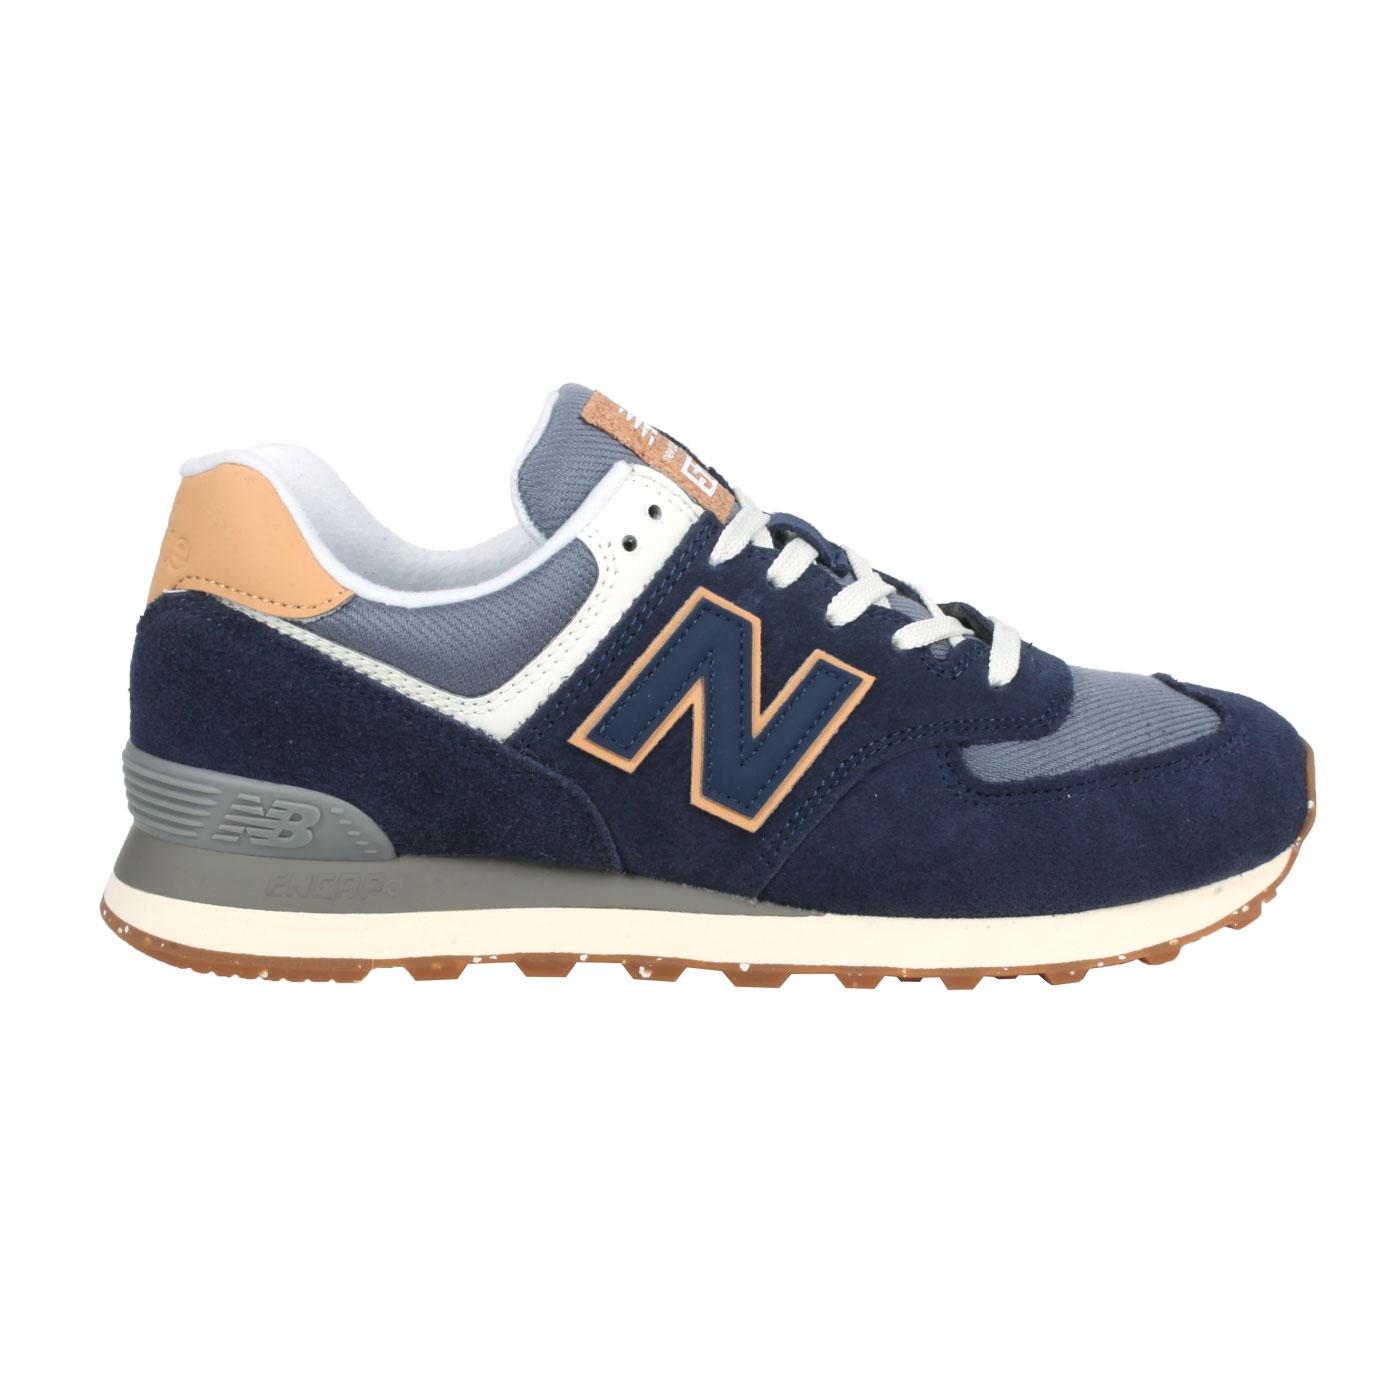 NEW BALANCE 男款復古休閒運動鞋 ML574AB2 - 丈青白棕